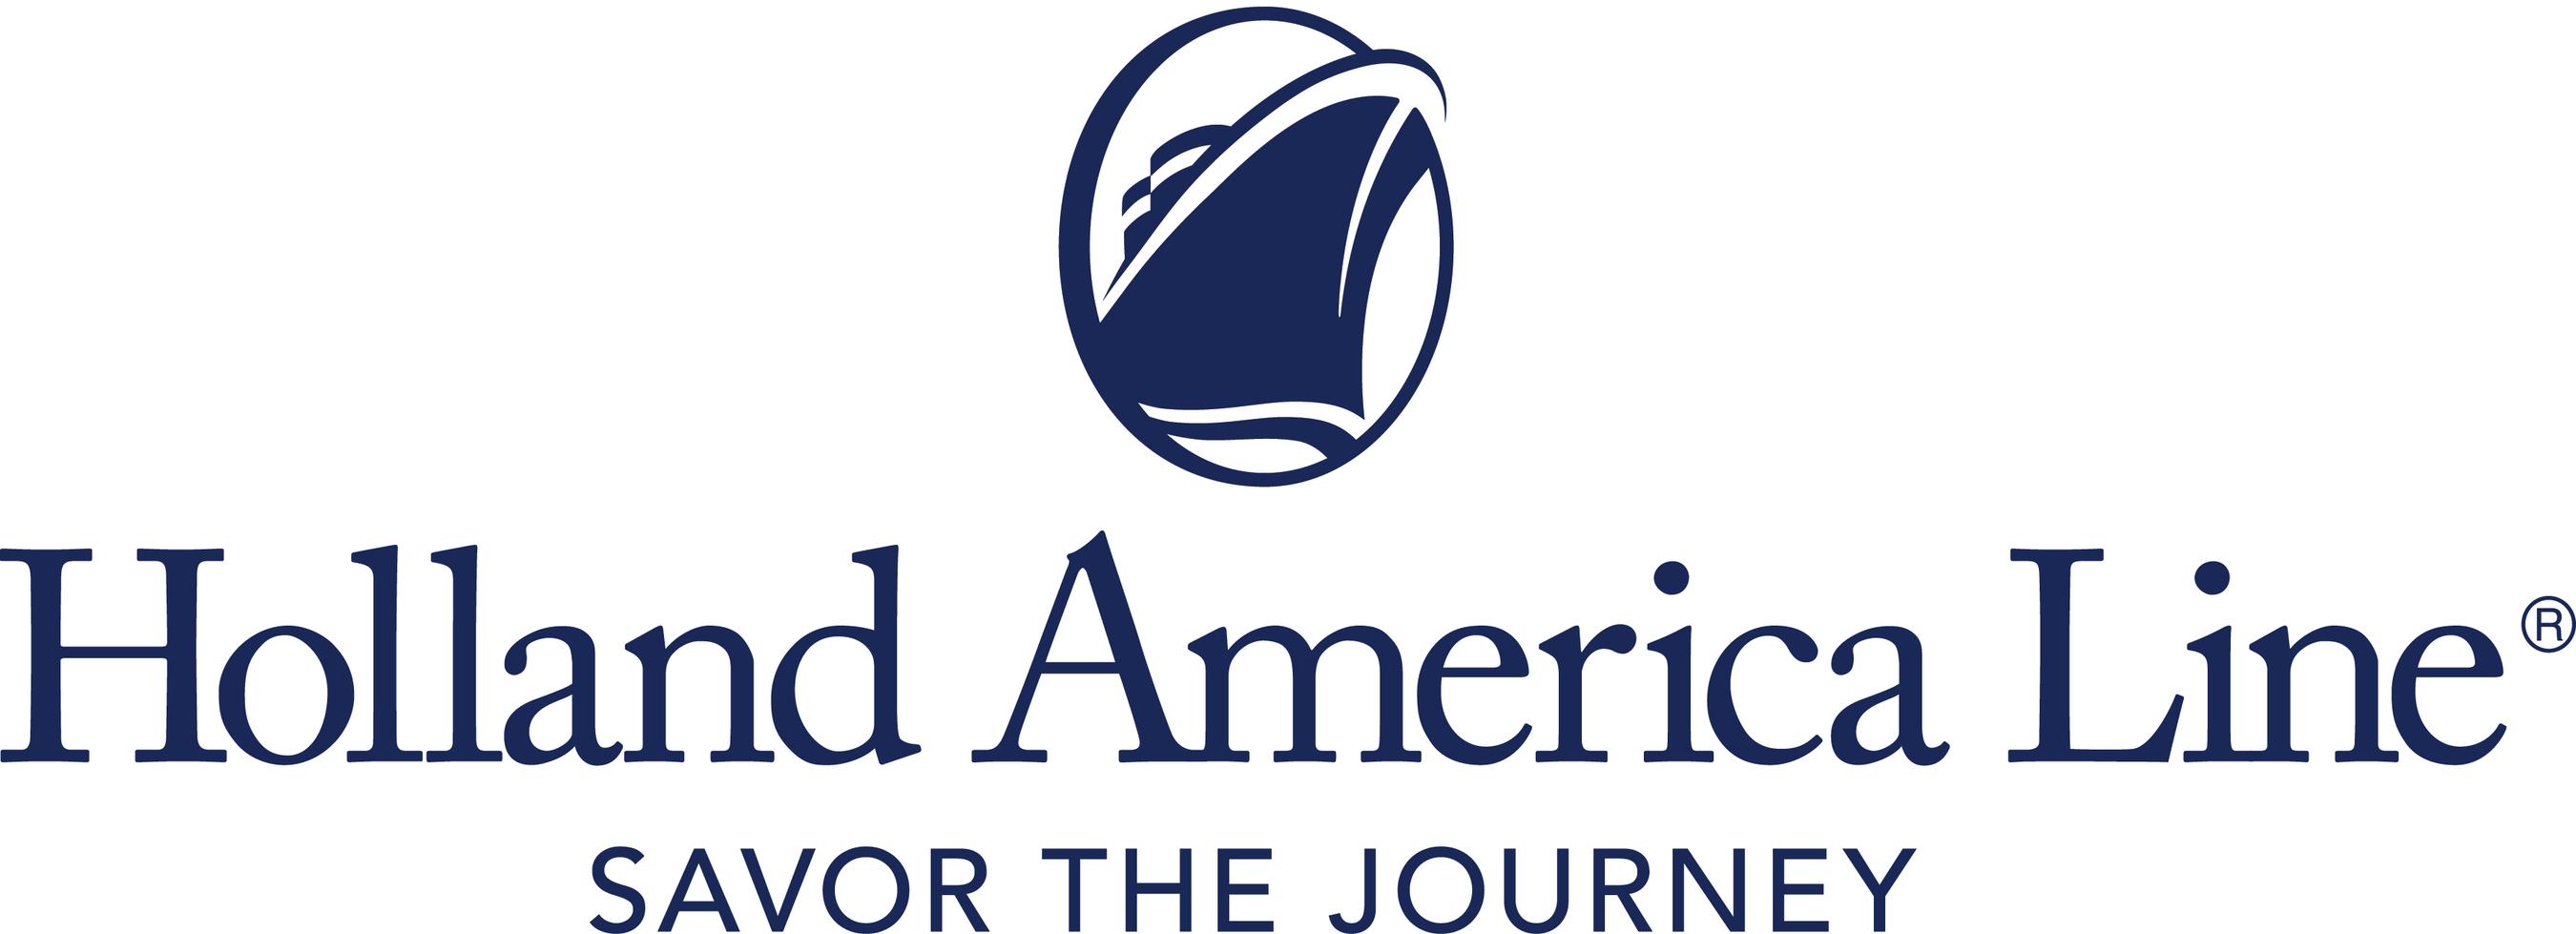 Holland America Line logo.